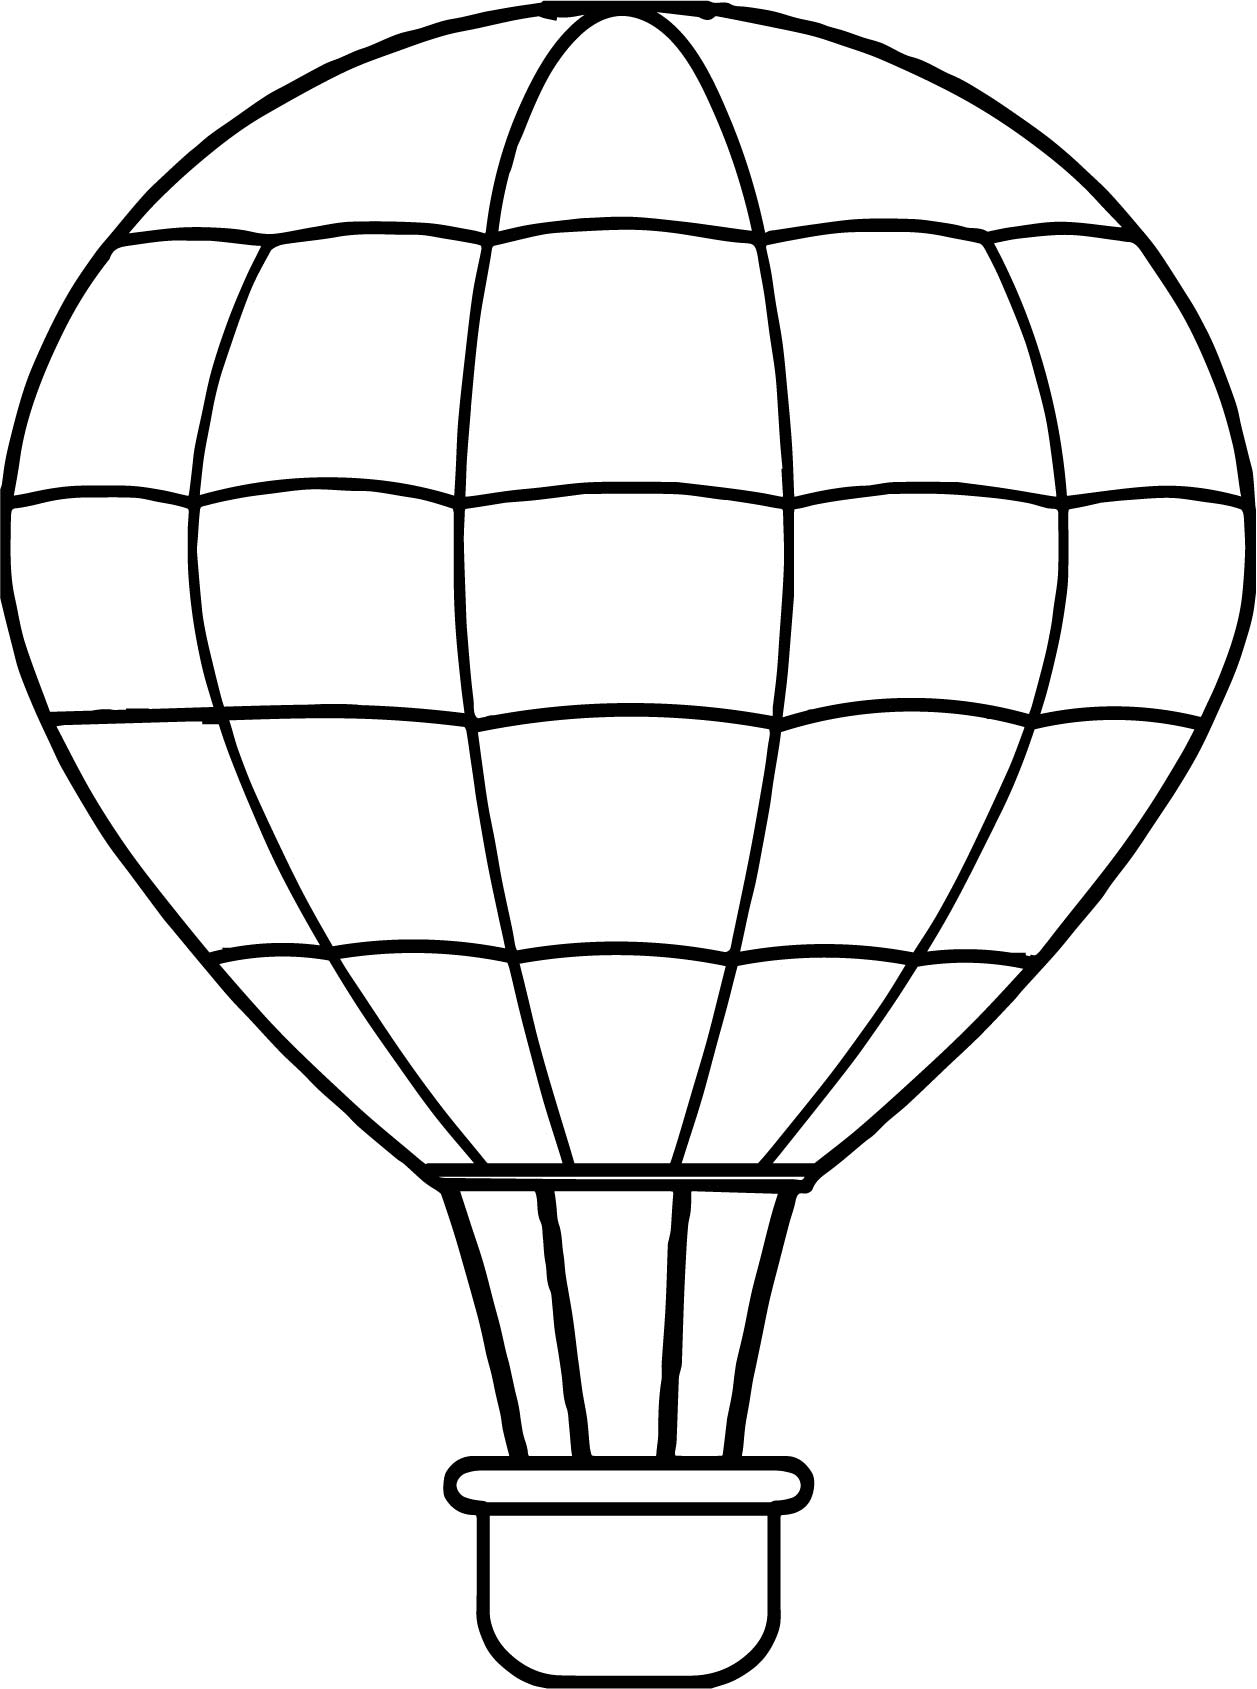 1257x1689 Air Balloon Line Coloring